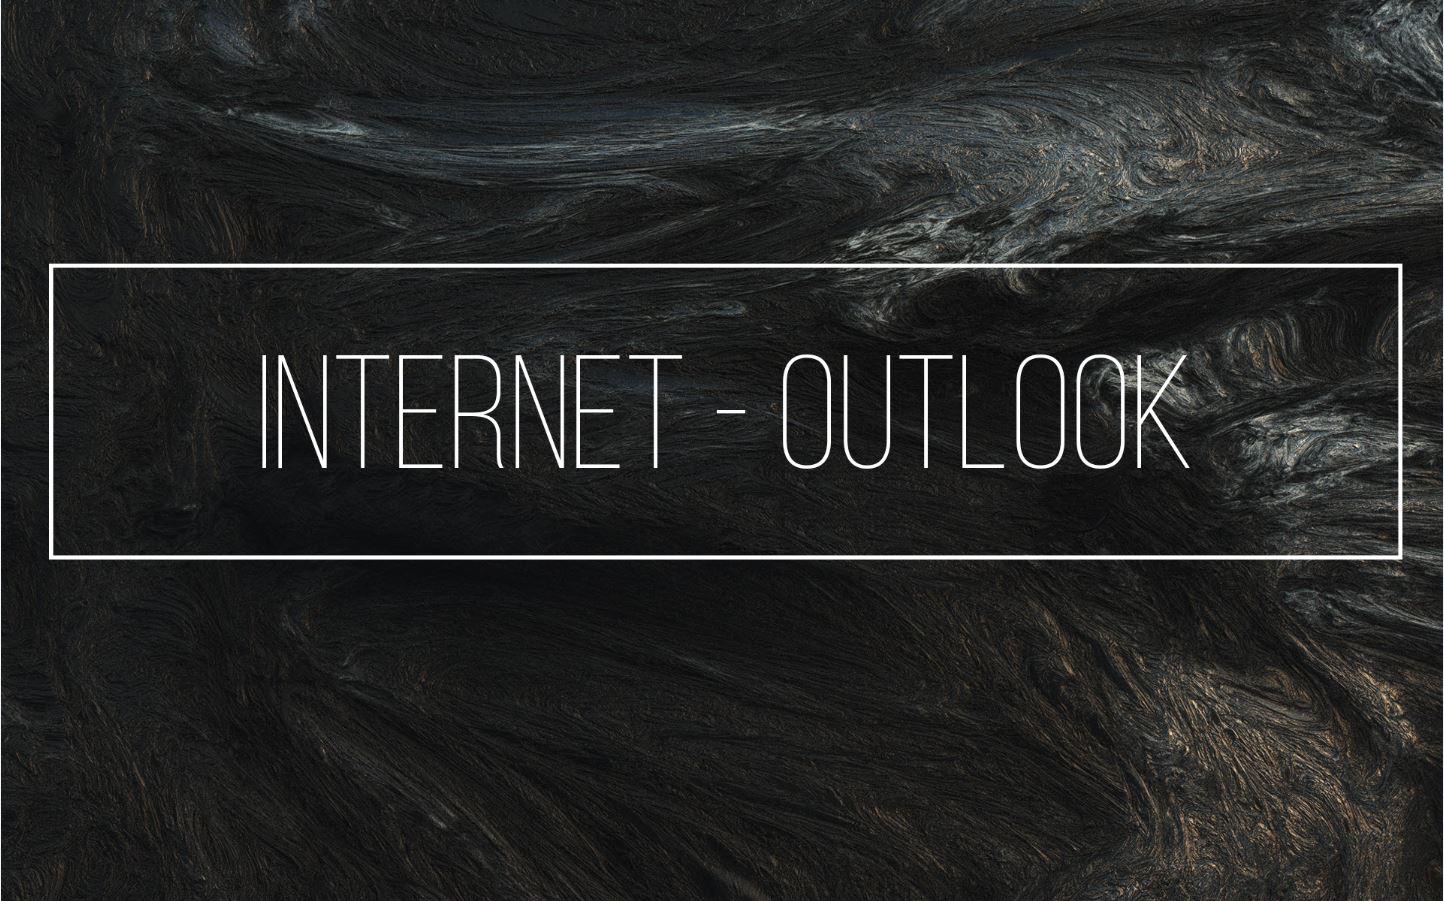 internet-outlook-1